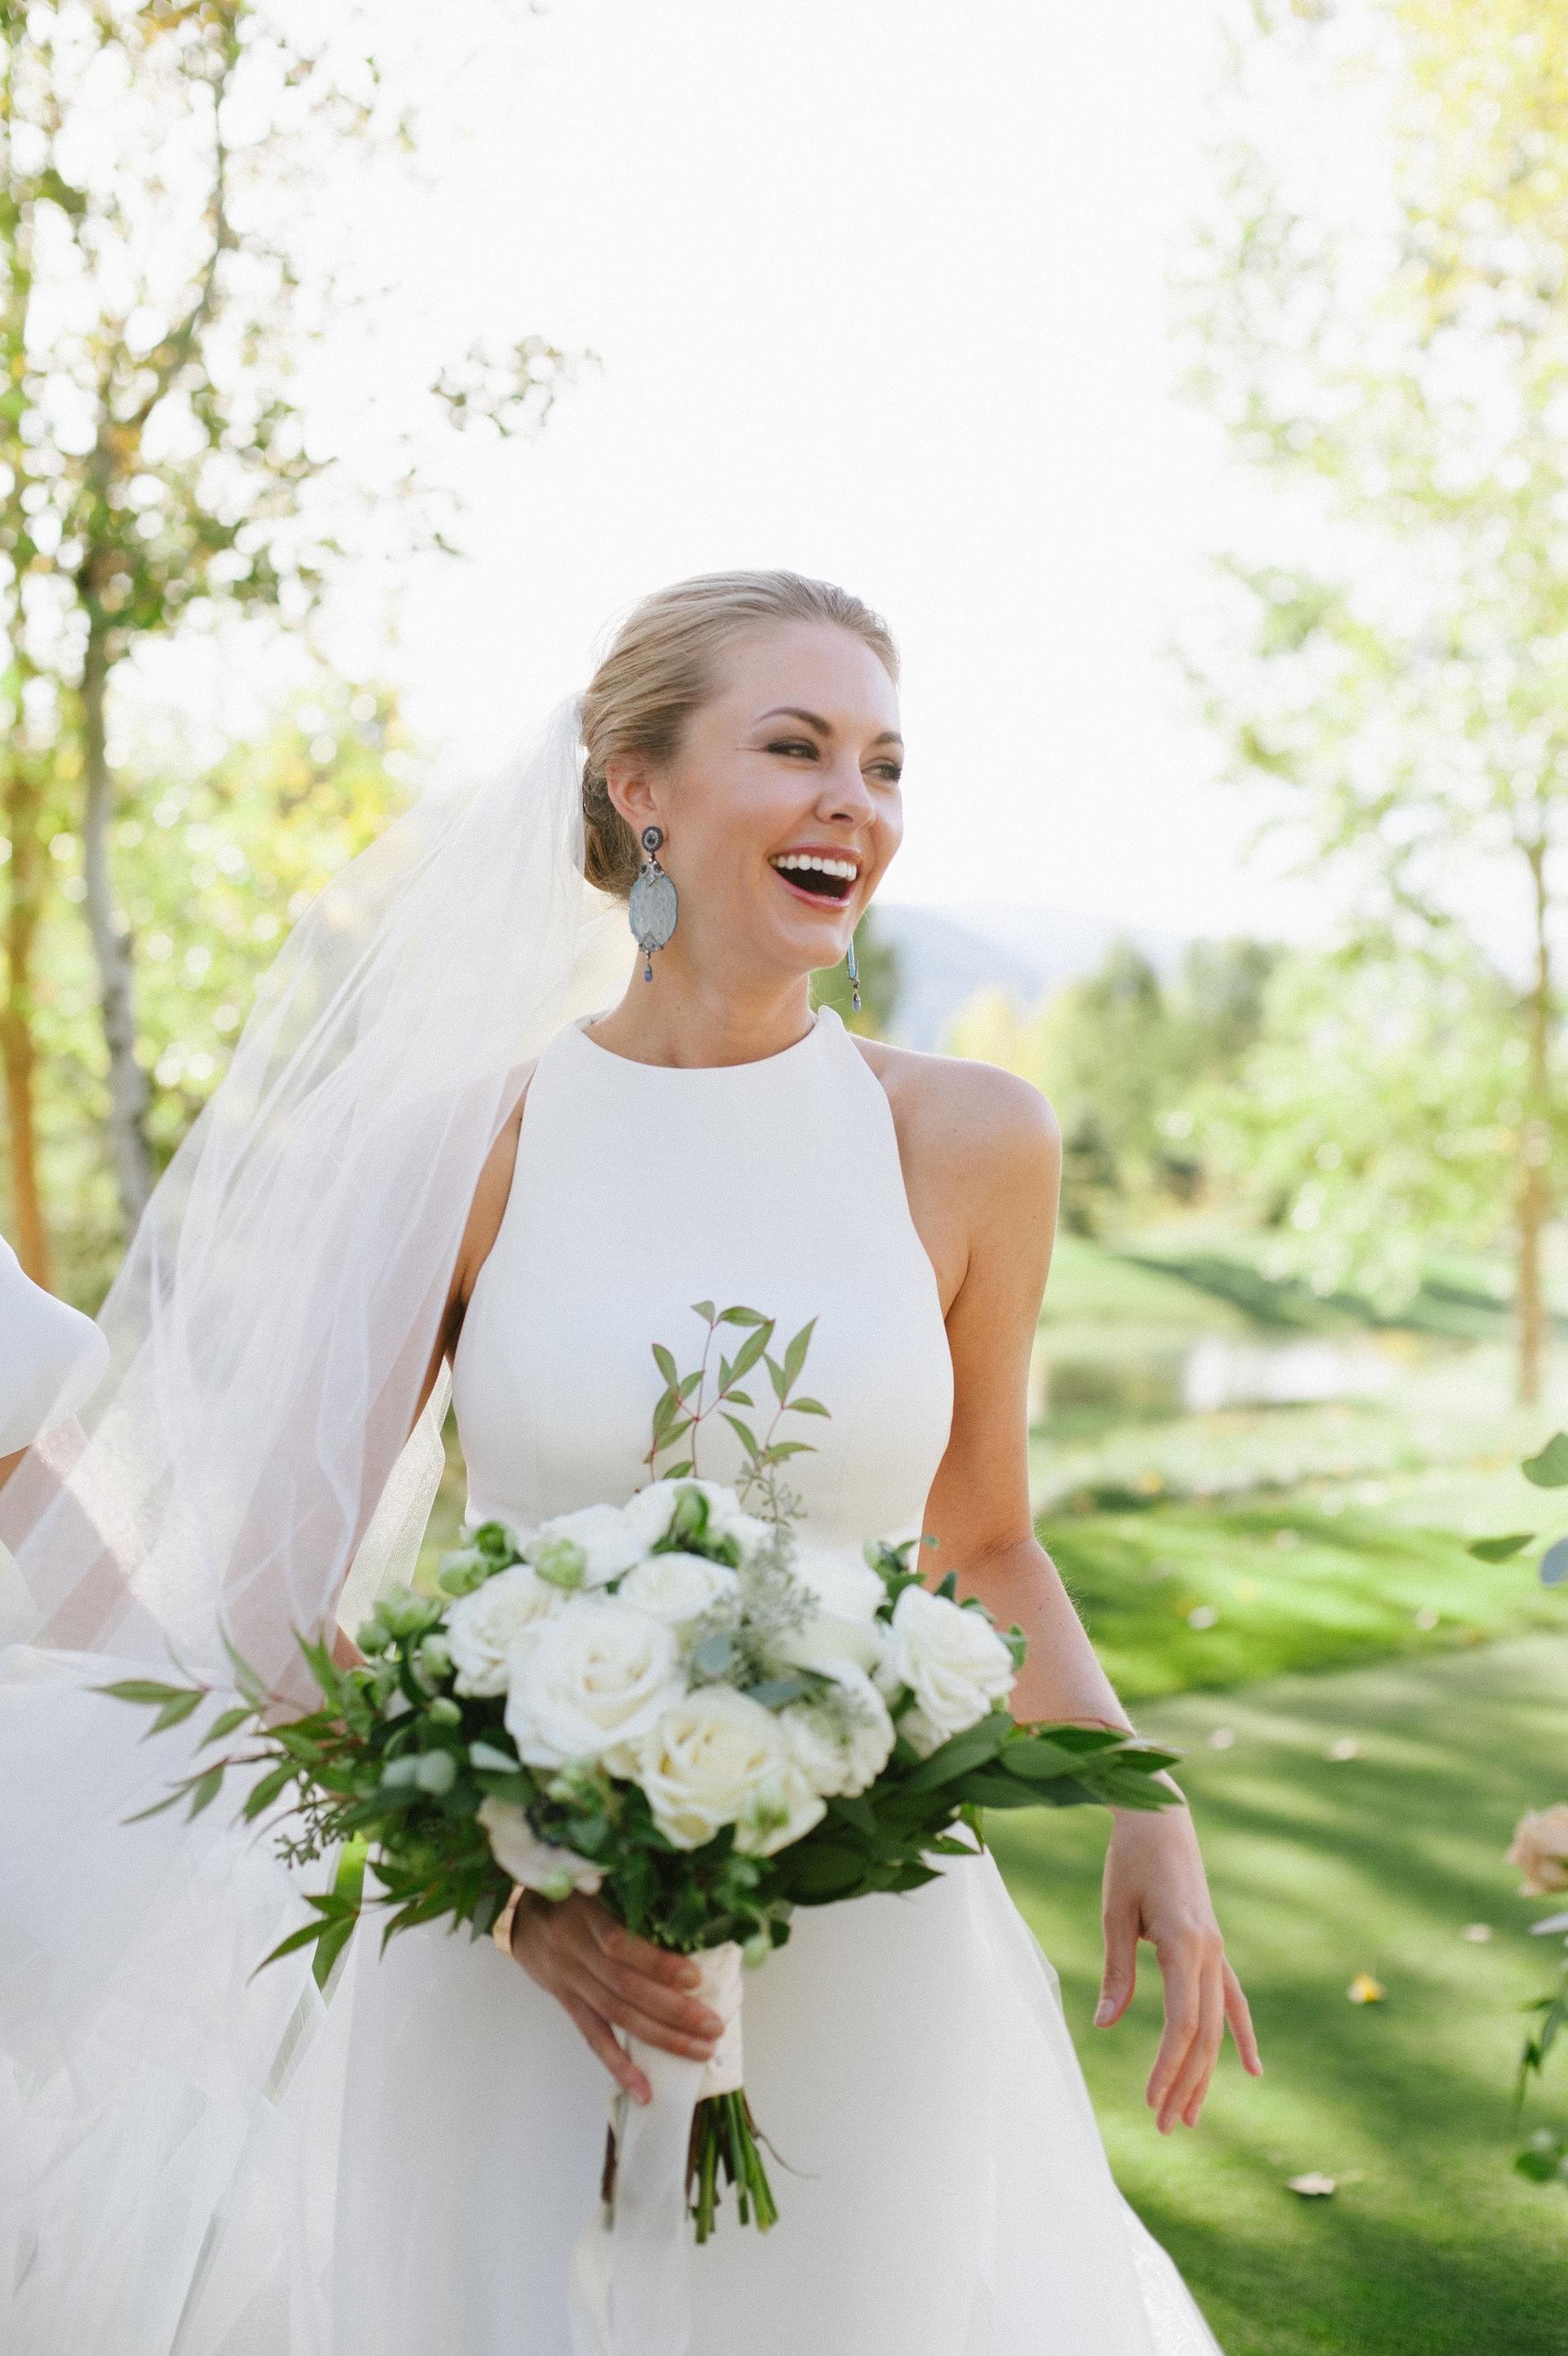 The Smarter Way to Wed | Aspen, Wedding and Weddings